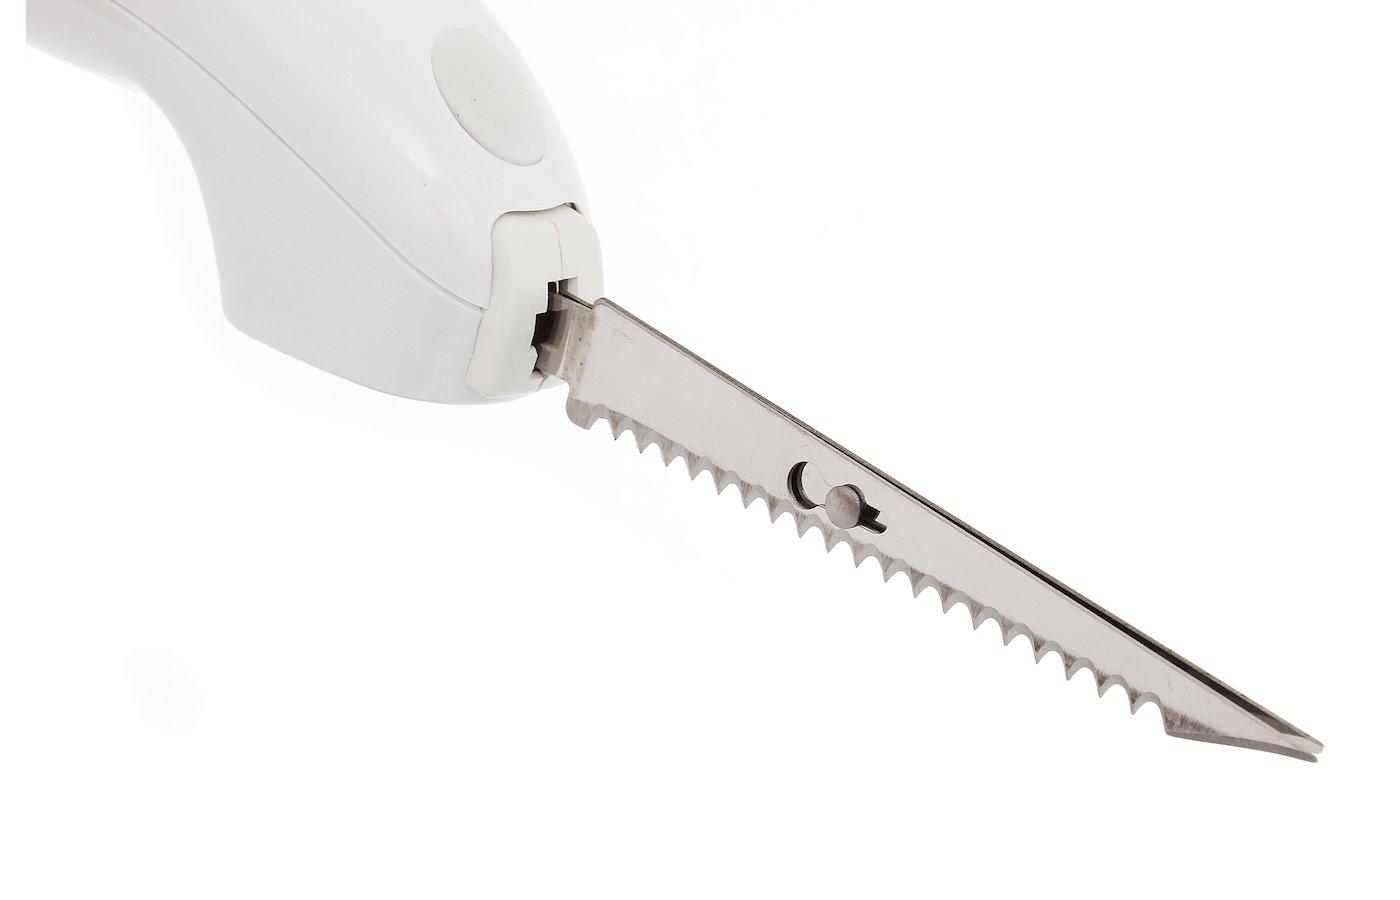 режущая часть ножа